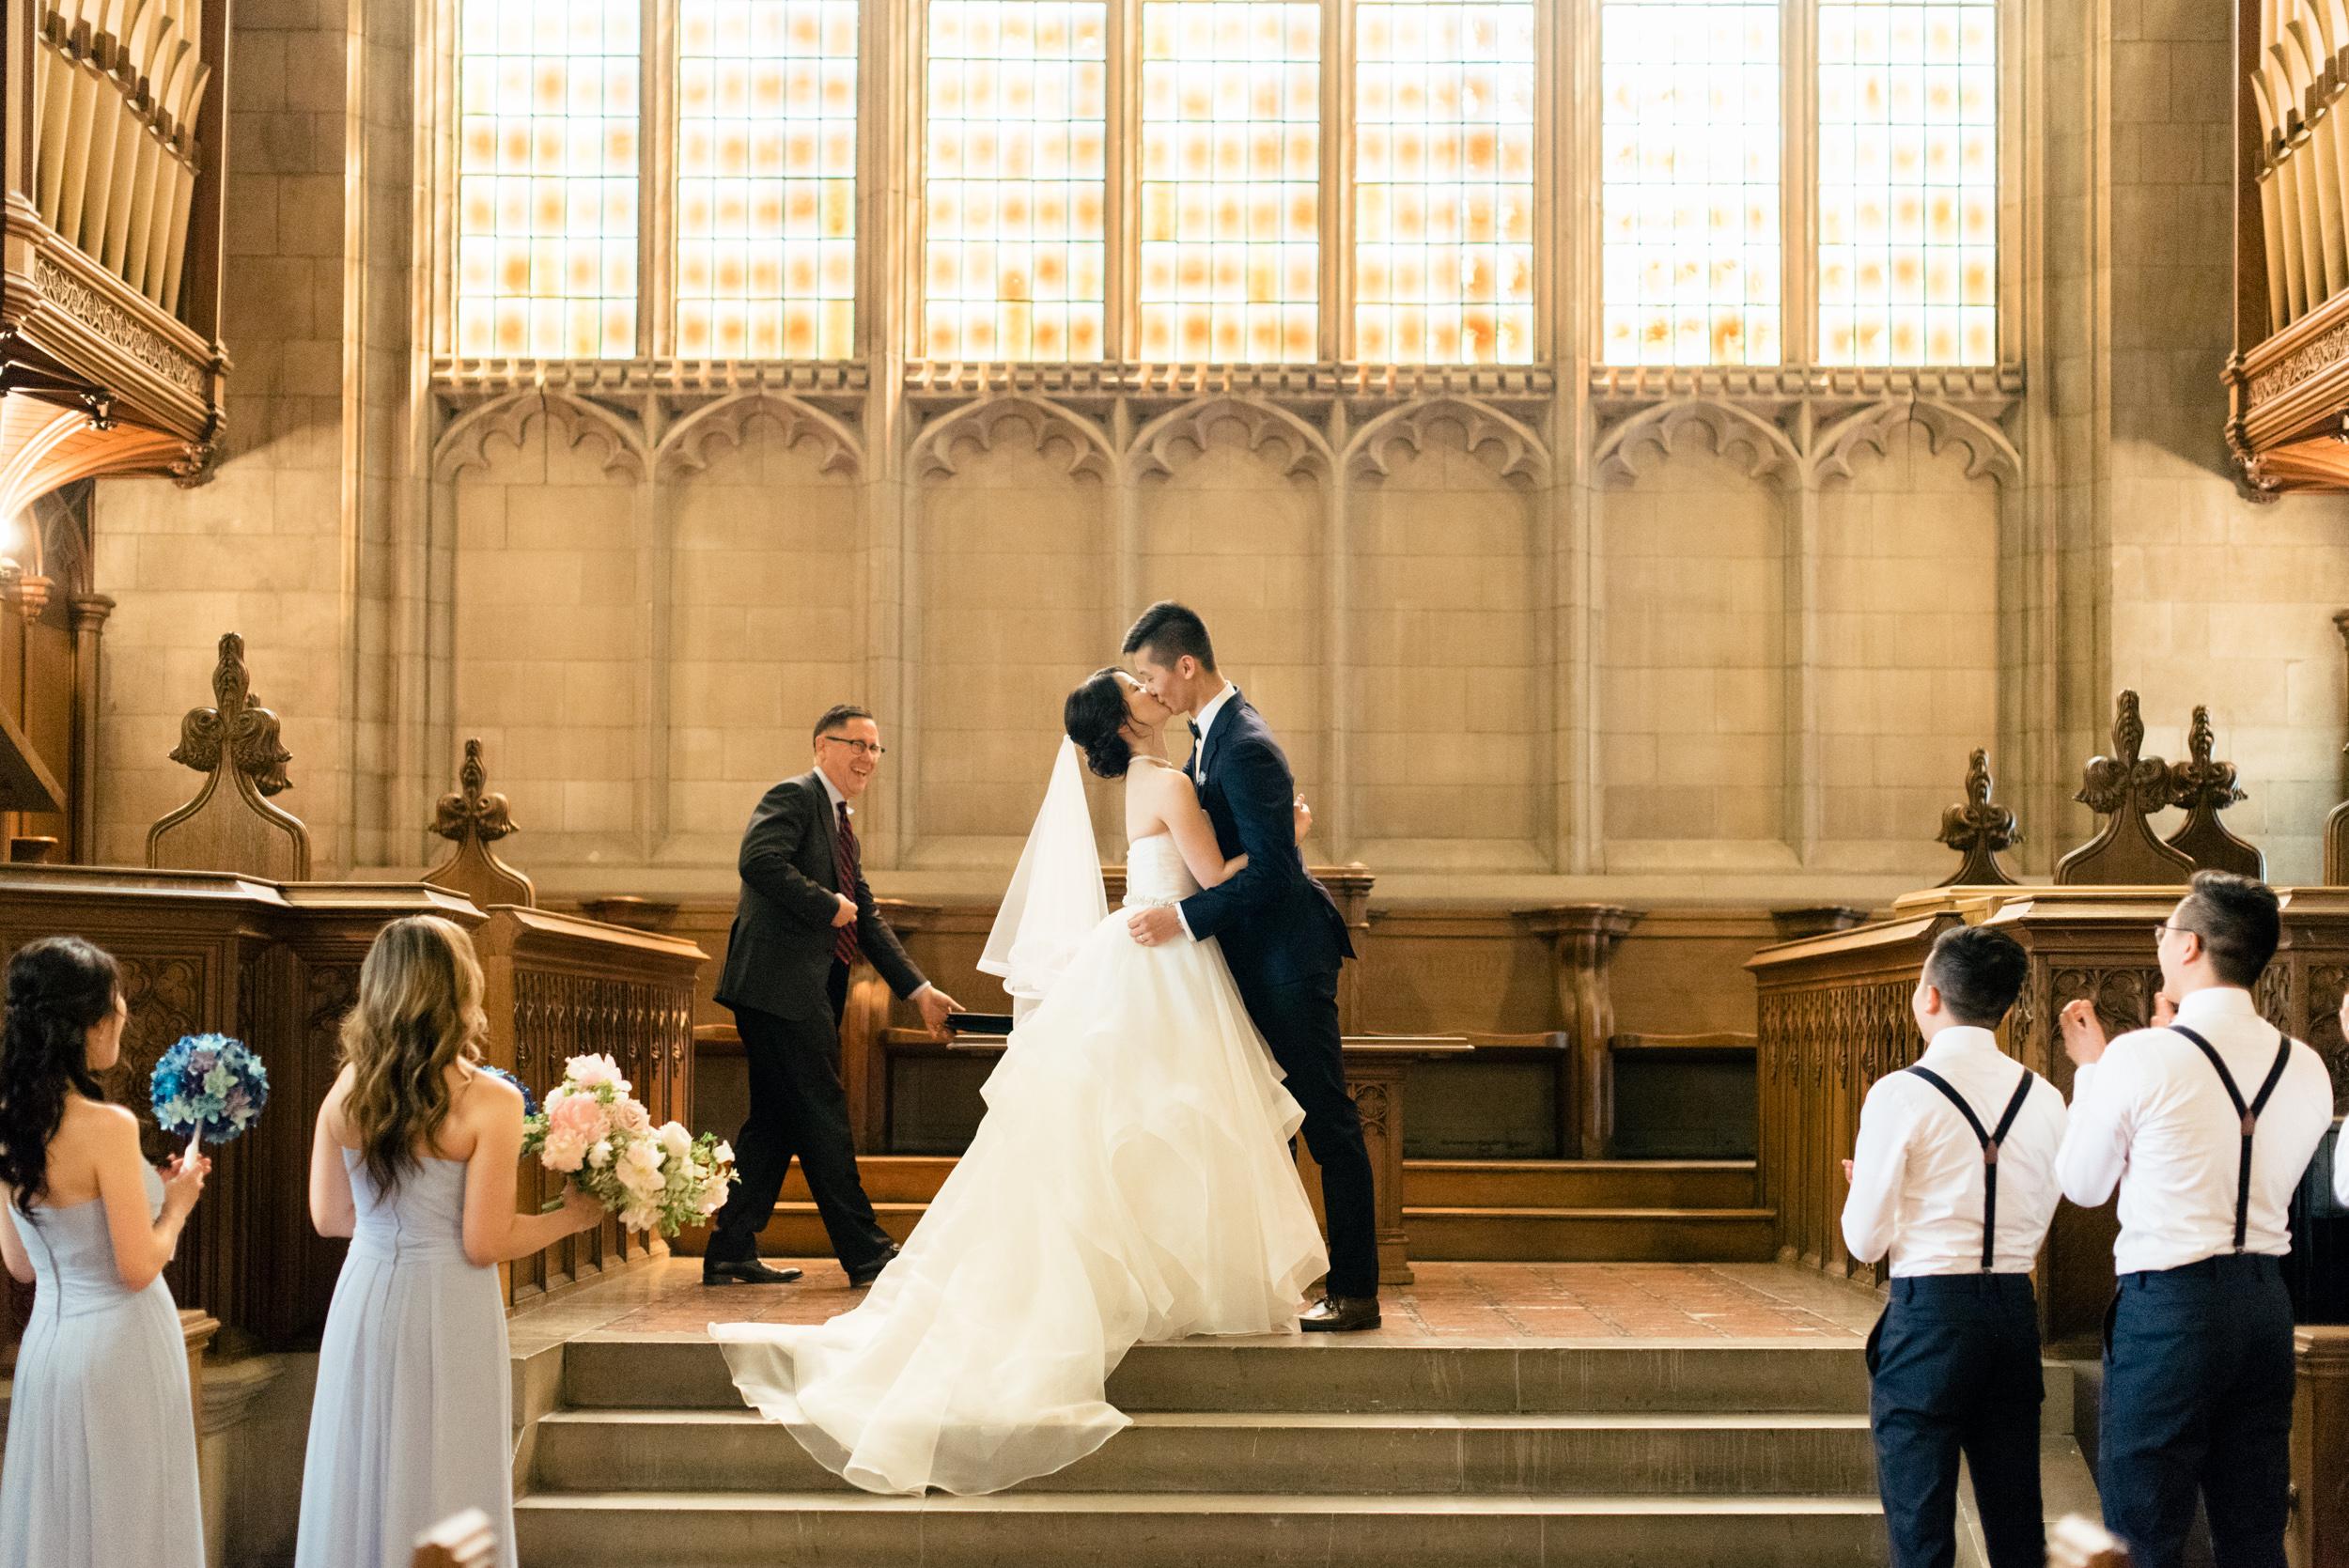 knox-college-wedding-146.jpg